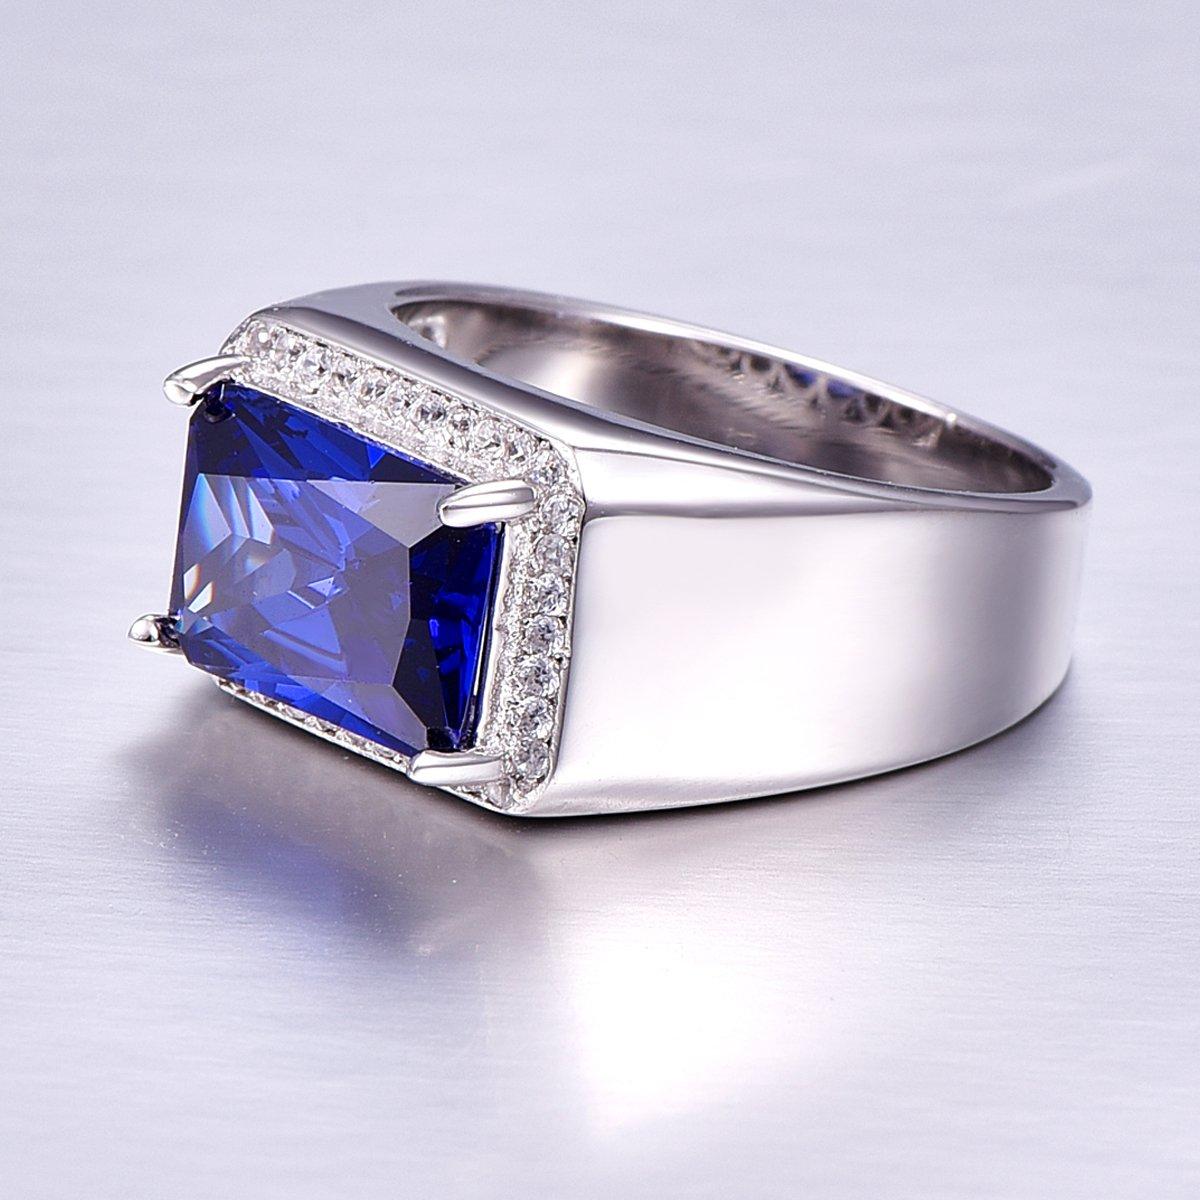 BONLAVIE 7.0ct Square Created Blue Sapphire 925 Sterling Silver Men's Ring Size 6 by BONLAVIE (Image #5)